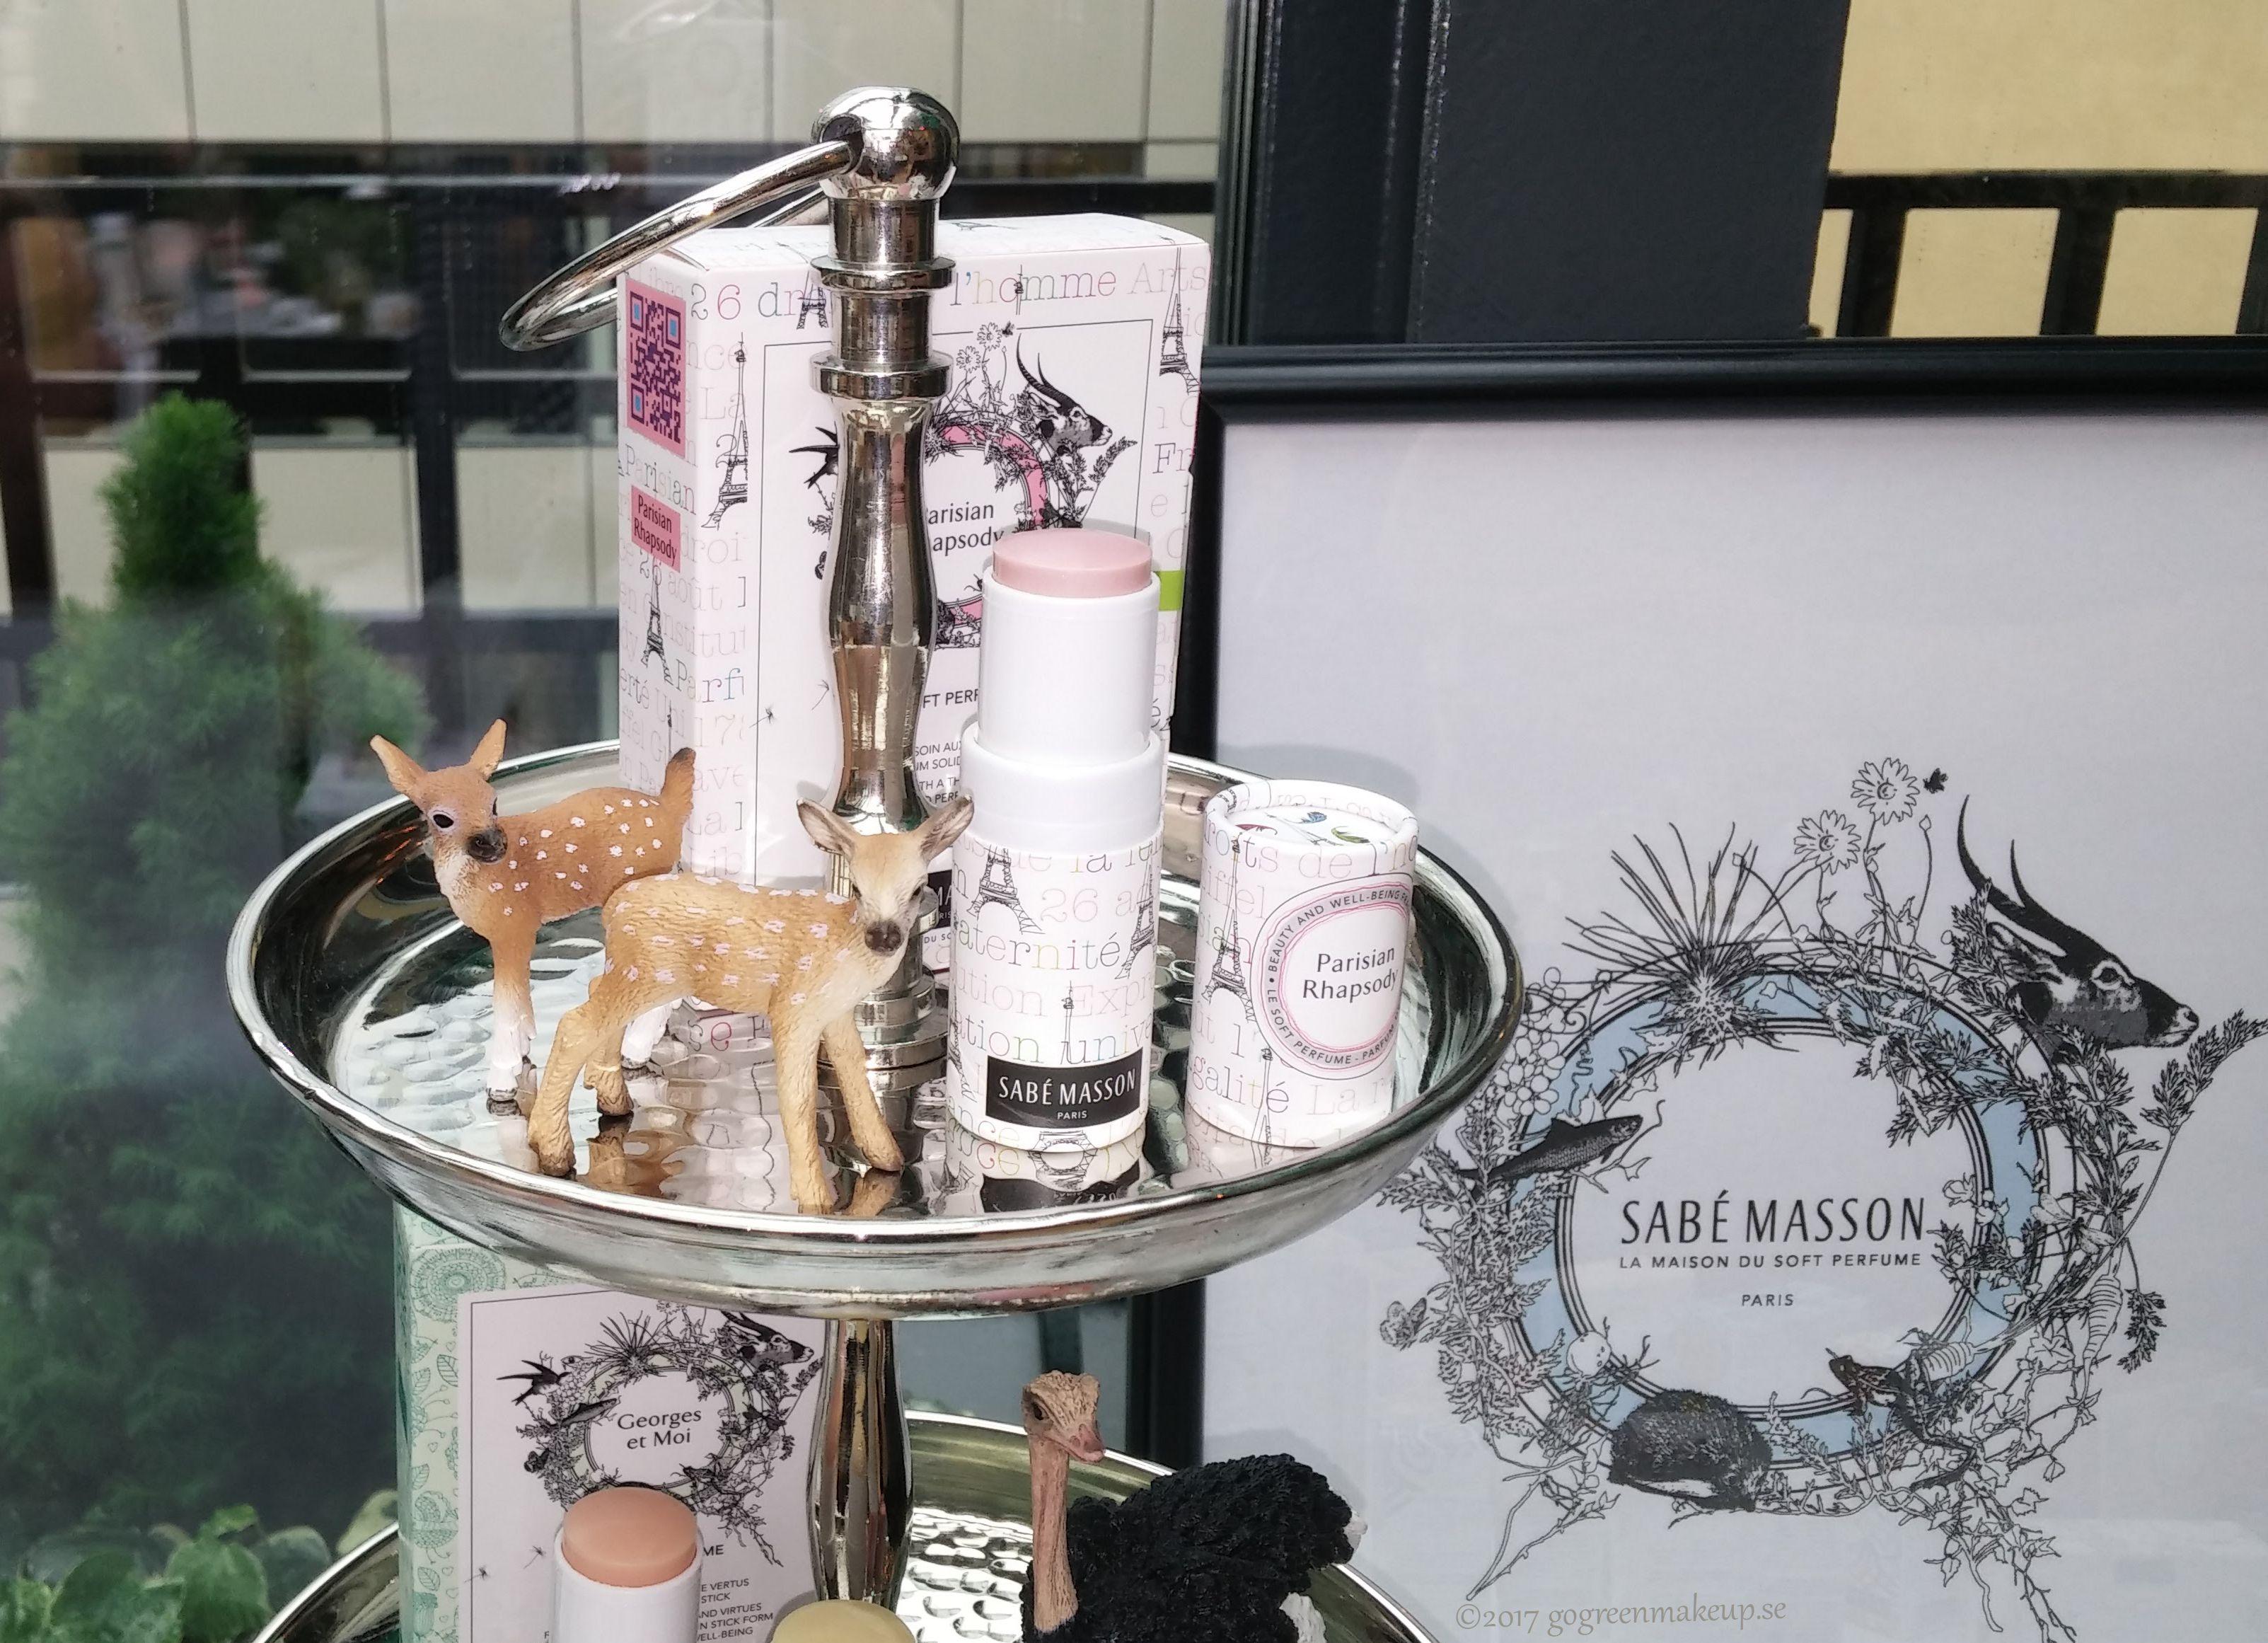 Sabé Masson ljuvlig naturlig parfym i stickform